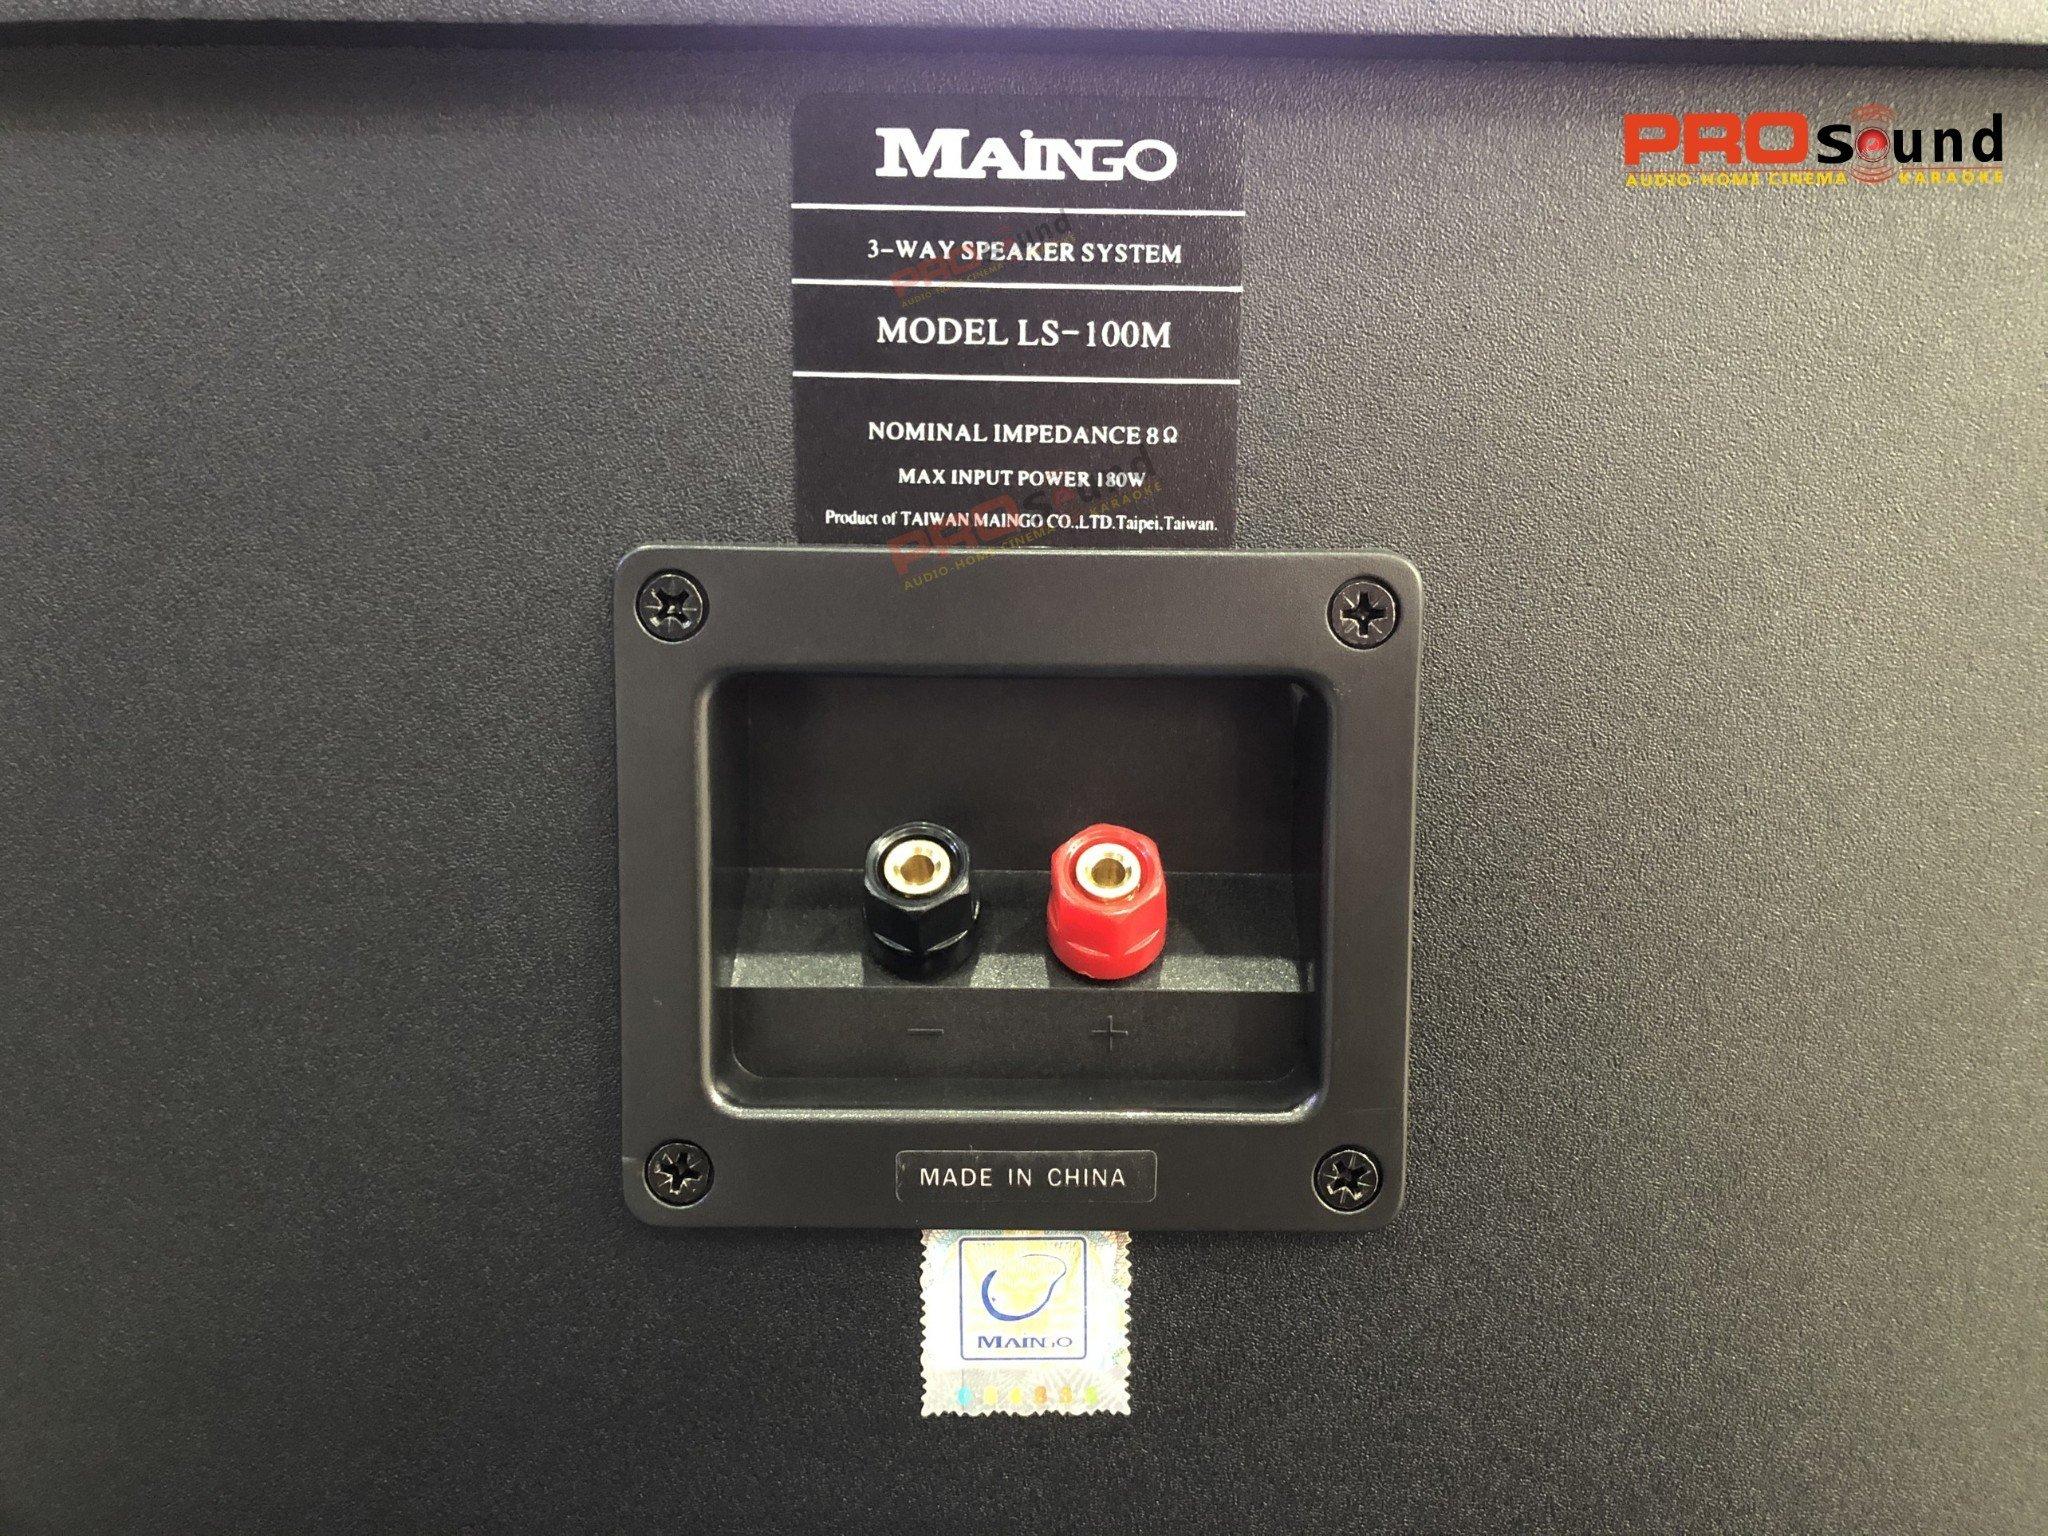 Loa Maingo LS-100M